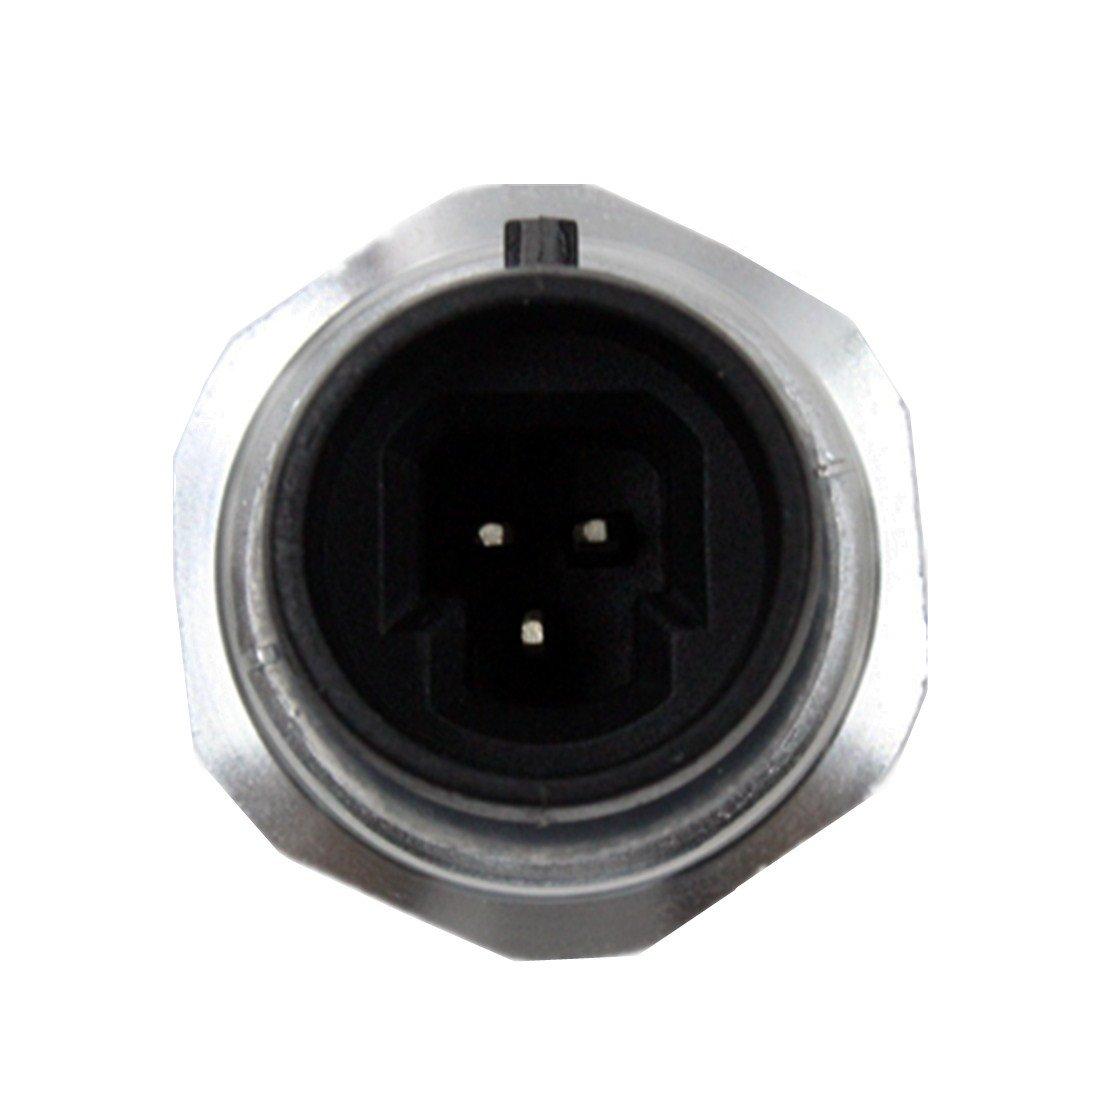 Def 12616646 Oil Pressure Sensor Switch D1846a Powerstroke Wiring Harness Sleeve Ps308 2078971144 8125731070 Gegt6610 For Gm Original Equipment Engine Automotive